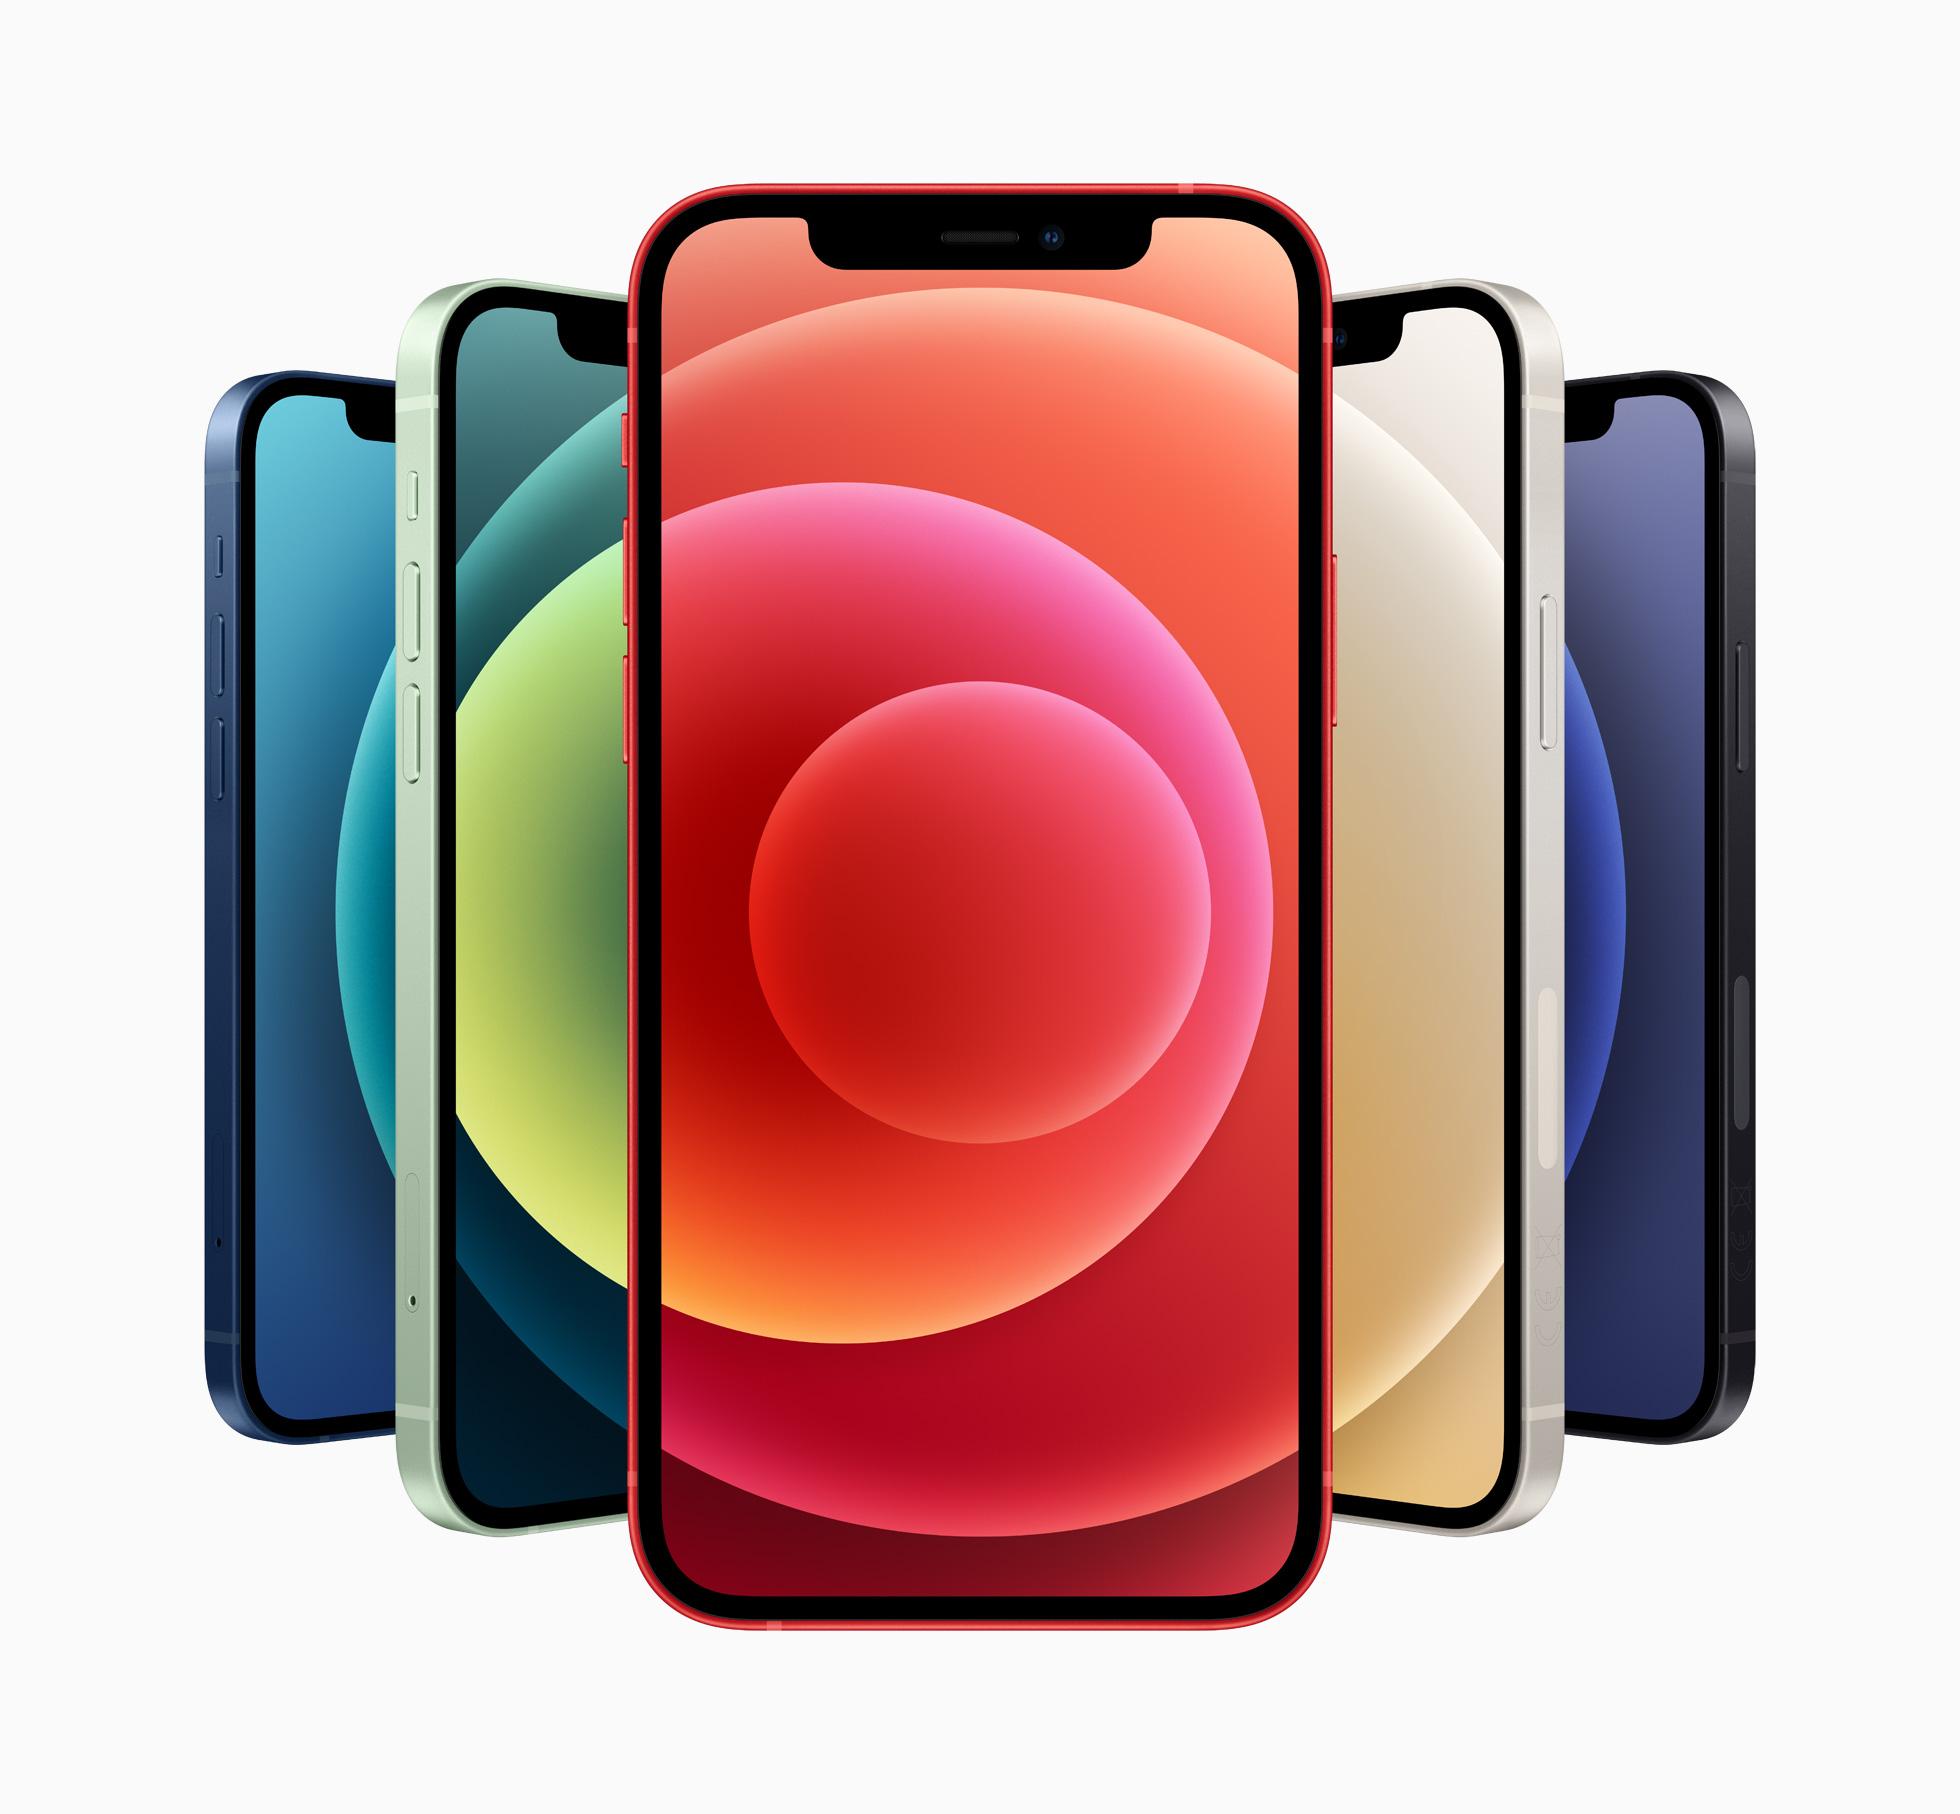 apple_iphone-12_new-design_10132020_big.jpg.large_2x.jpg